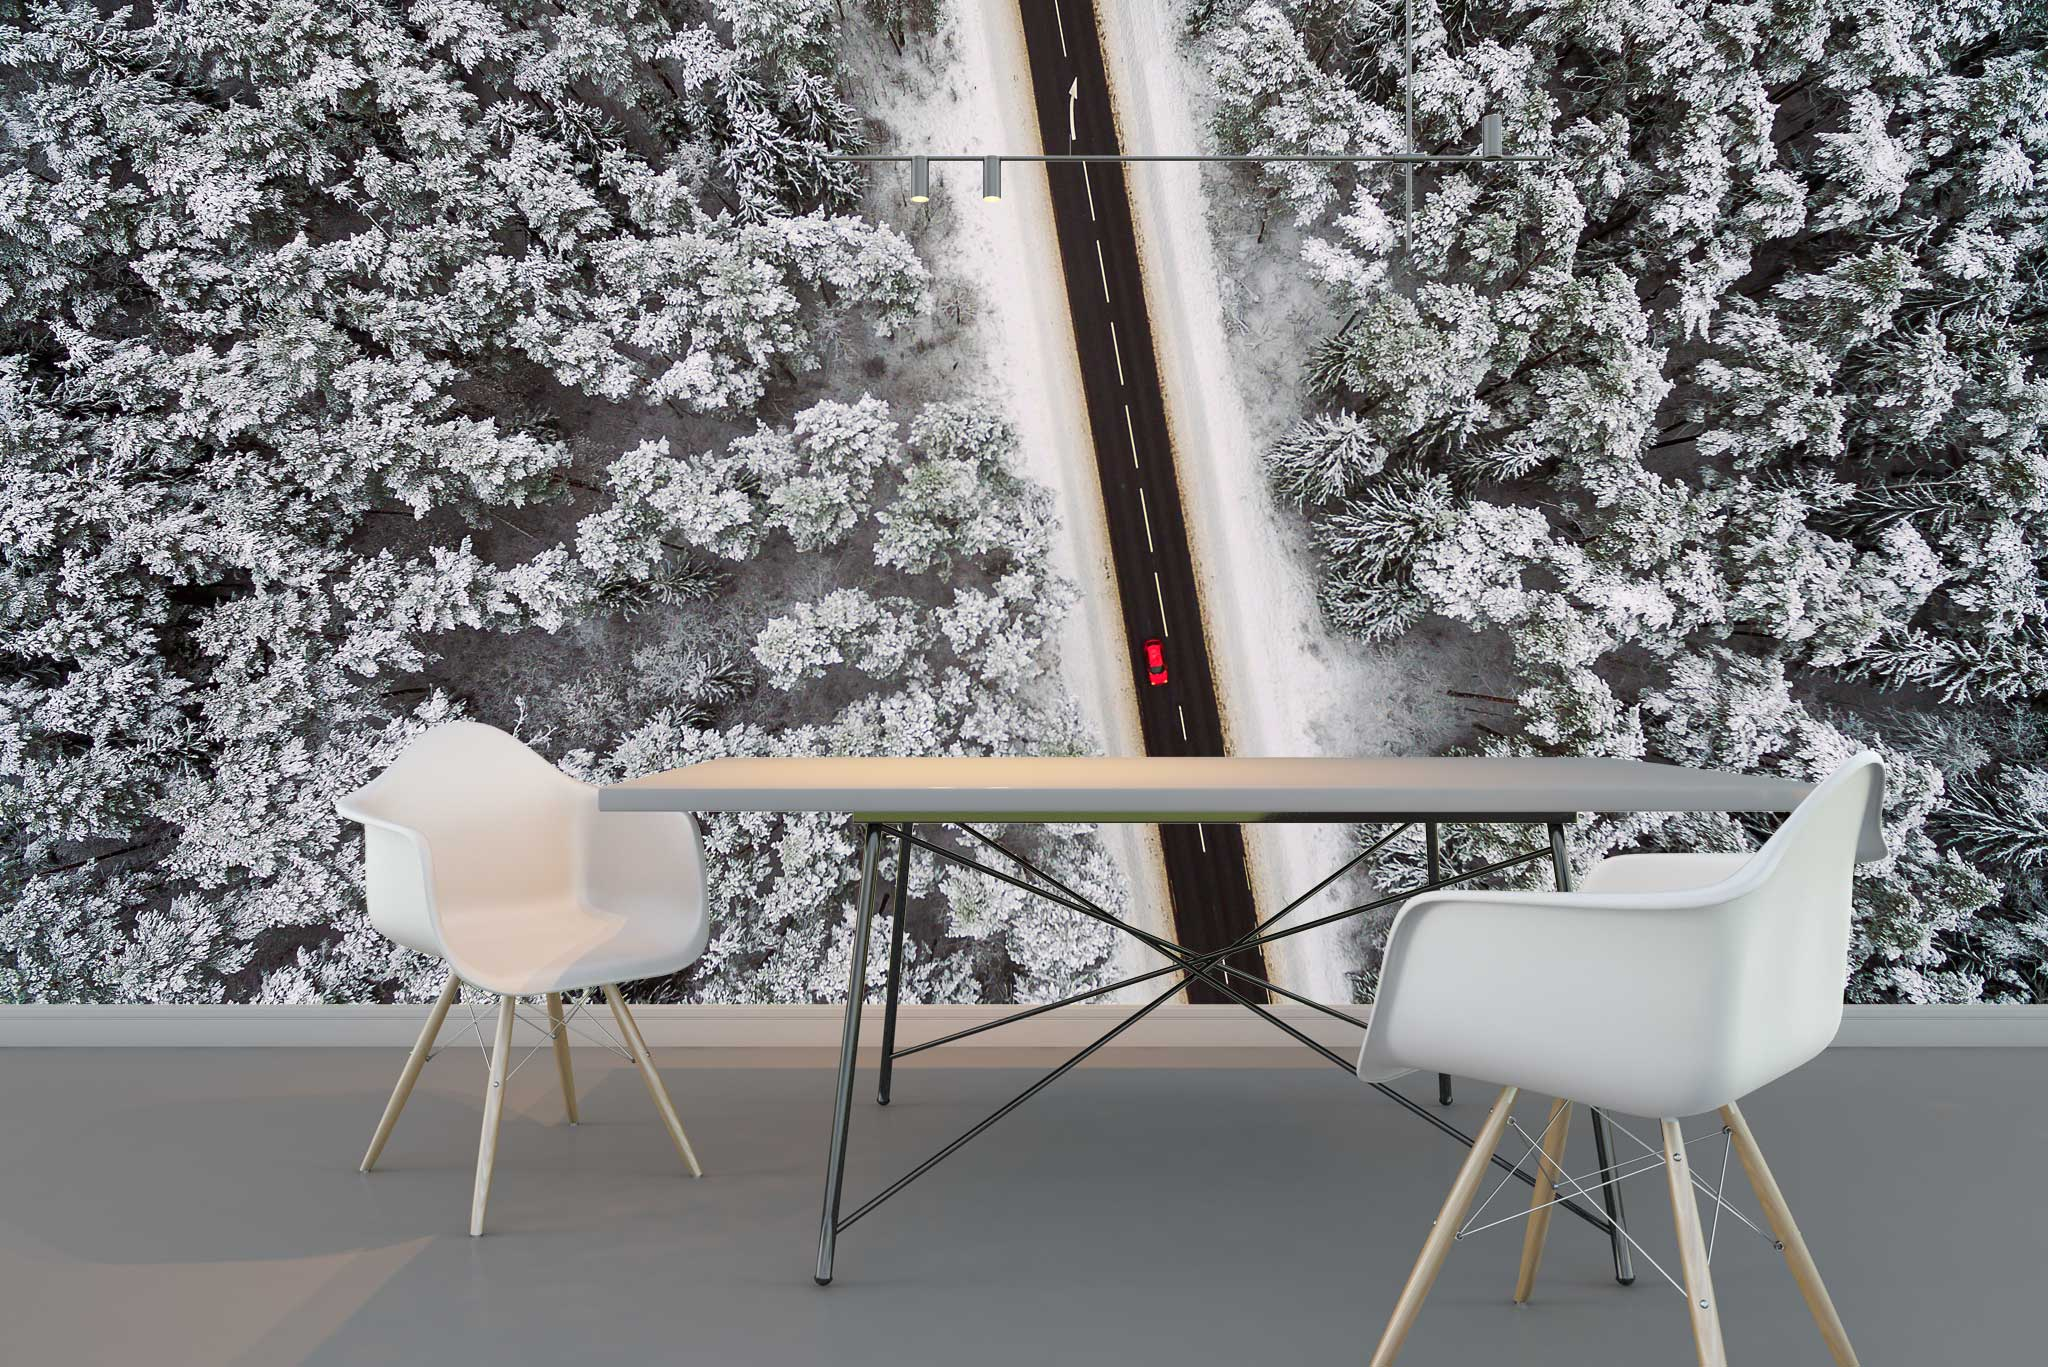 tapet-fototapet-comanda-personalizat-bucuresti-perete-special-lux-model-fotografie-aeriana-sosea-padure-iarna